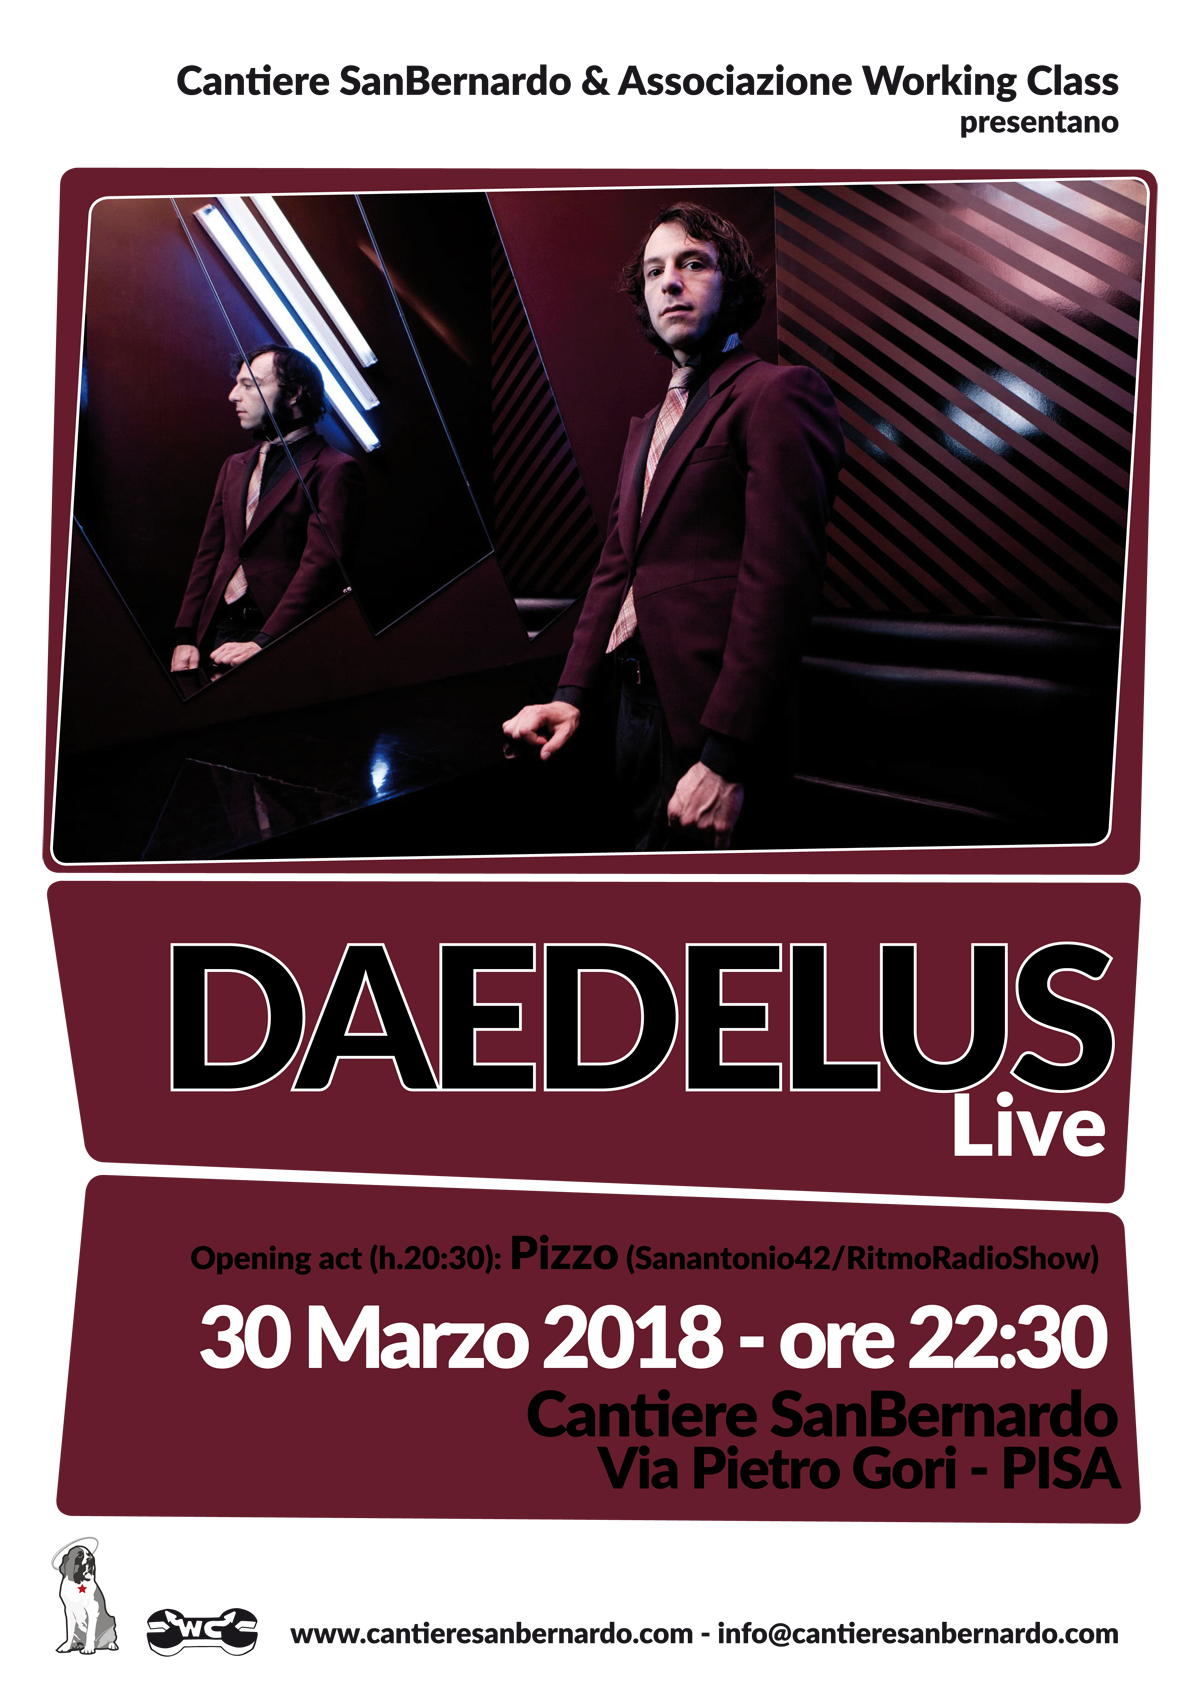 Daedelus Live